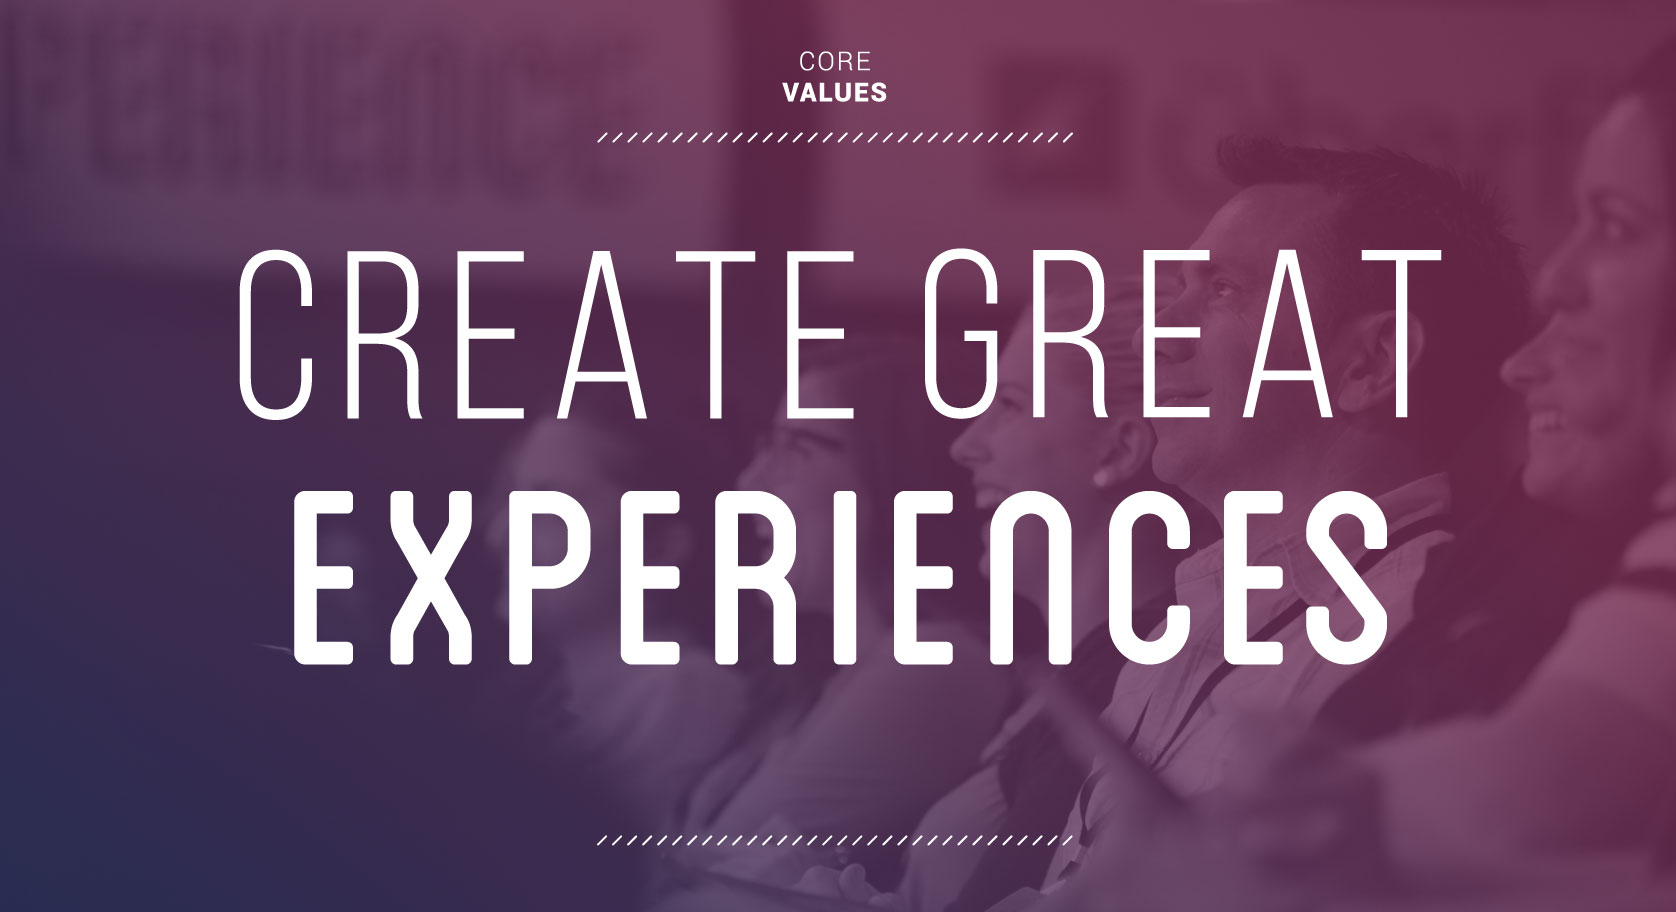 Core Value Great Experiences | Uberflip